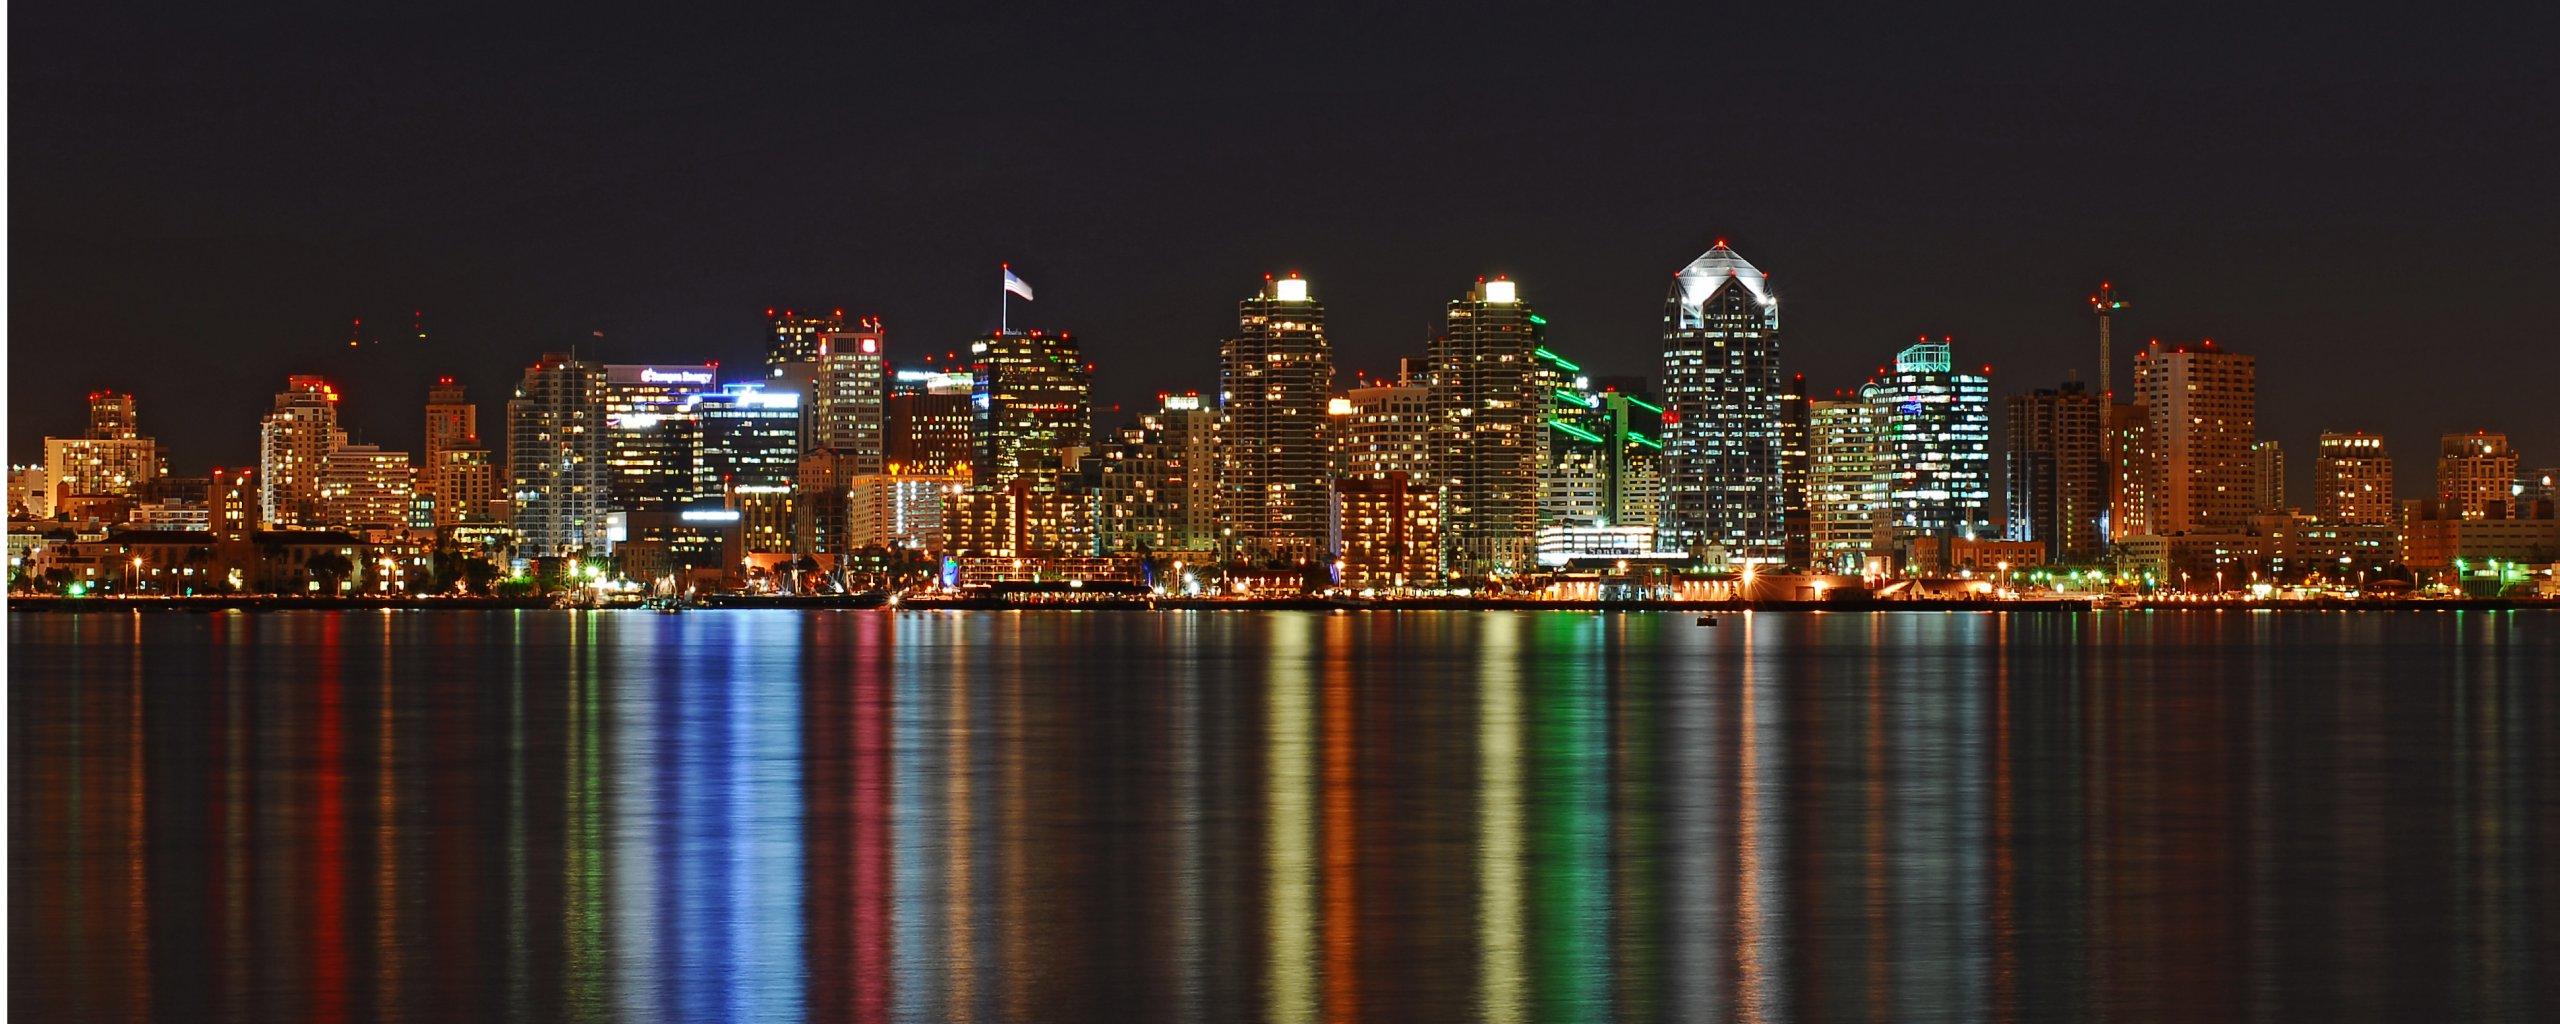 http://www.surech.ch/wp-content/uploads/2006/12/San_Diego_Reflecting_Pond.jpg